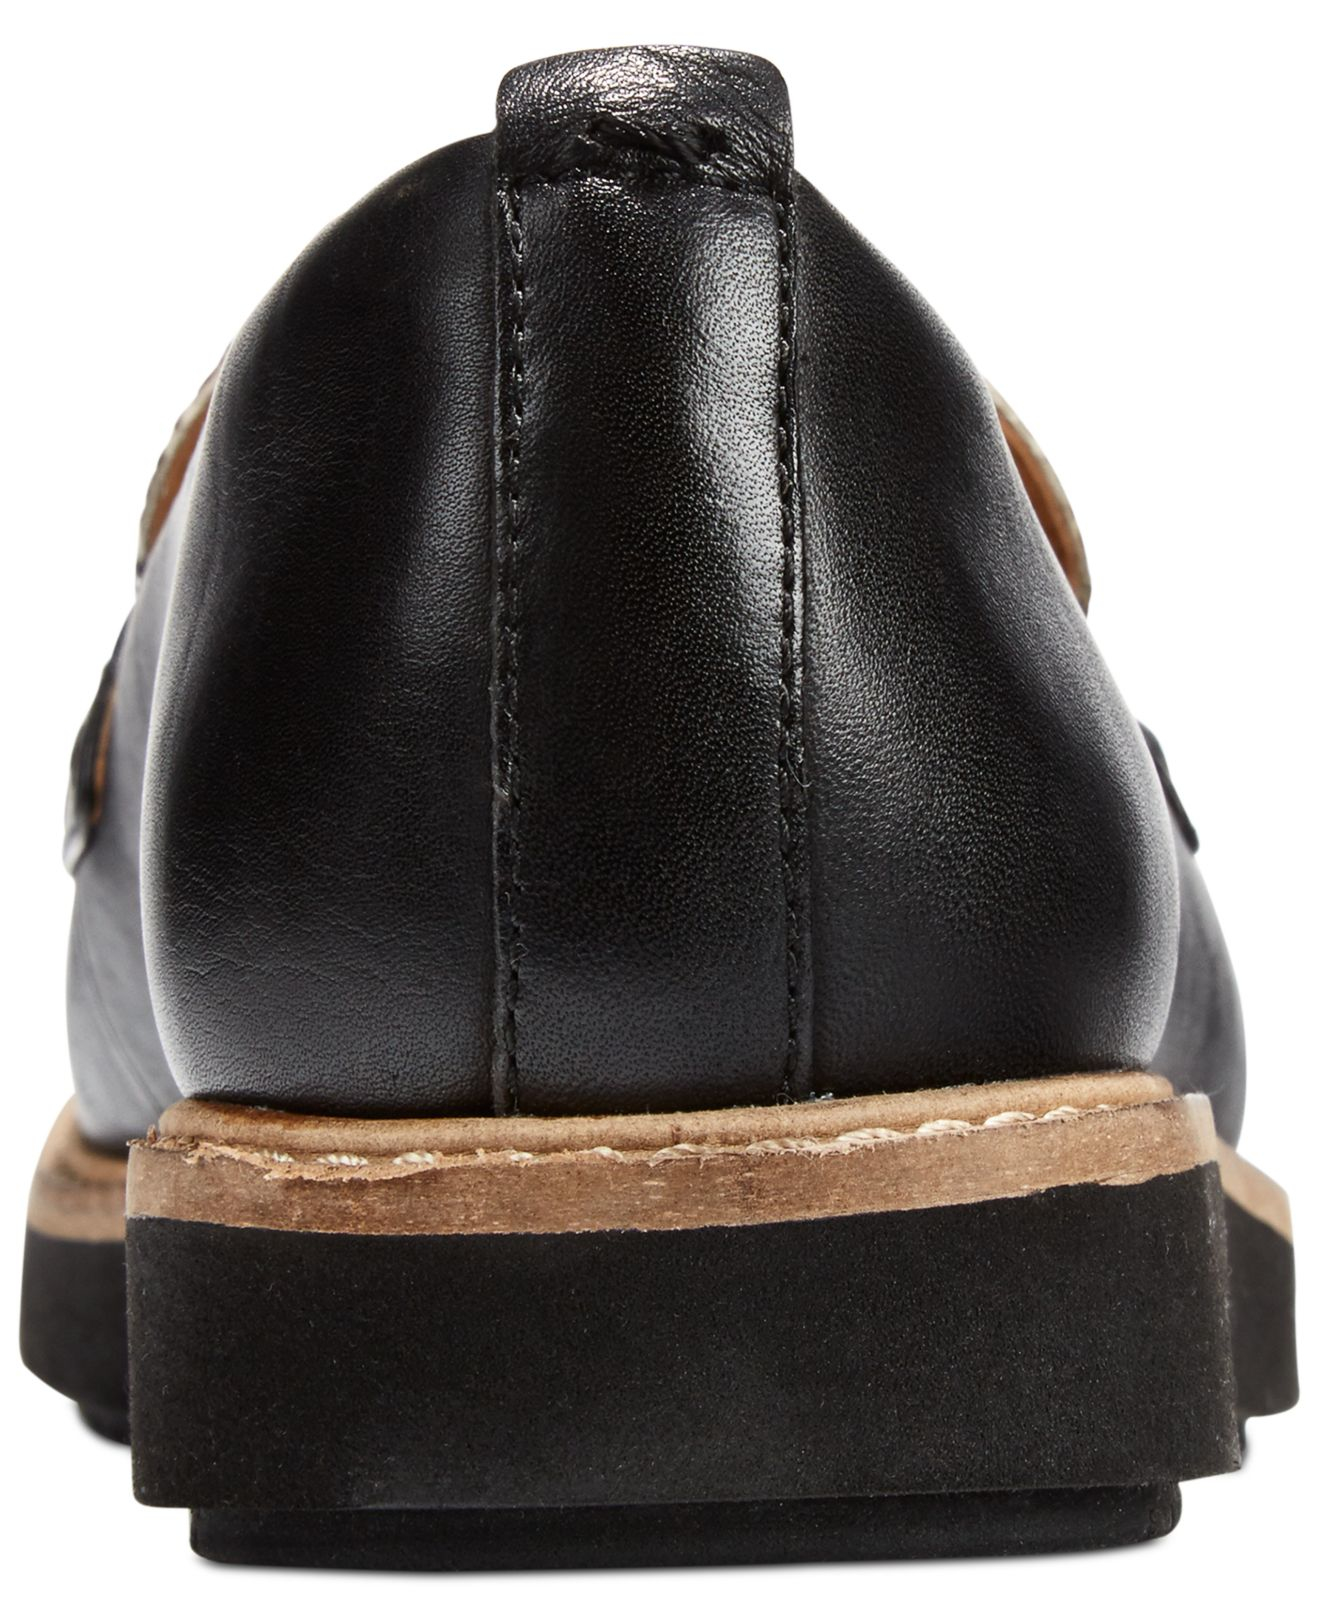 a44150b16f8 Lyst - Clarks Artisan Women s Glick Avalee Flats in Black